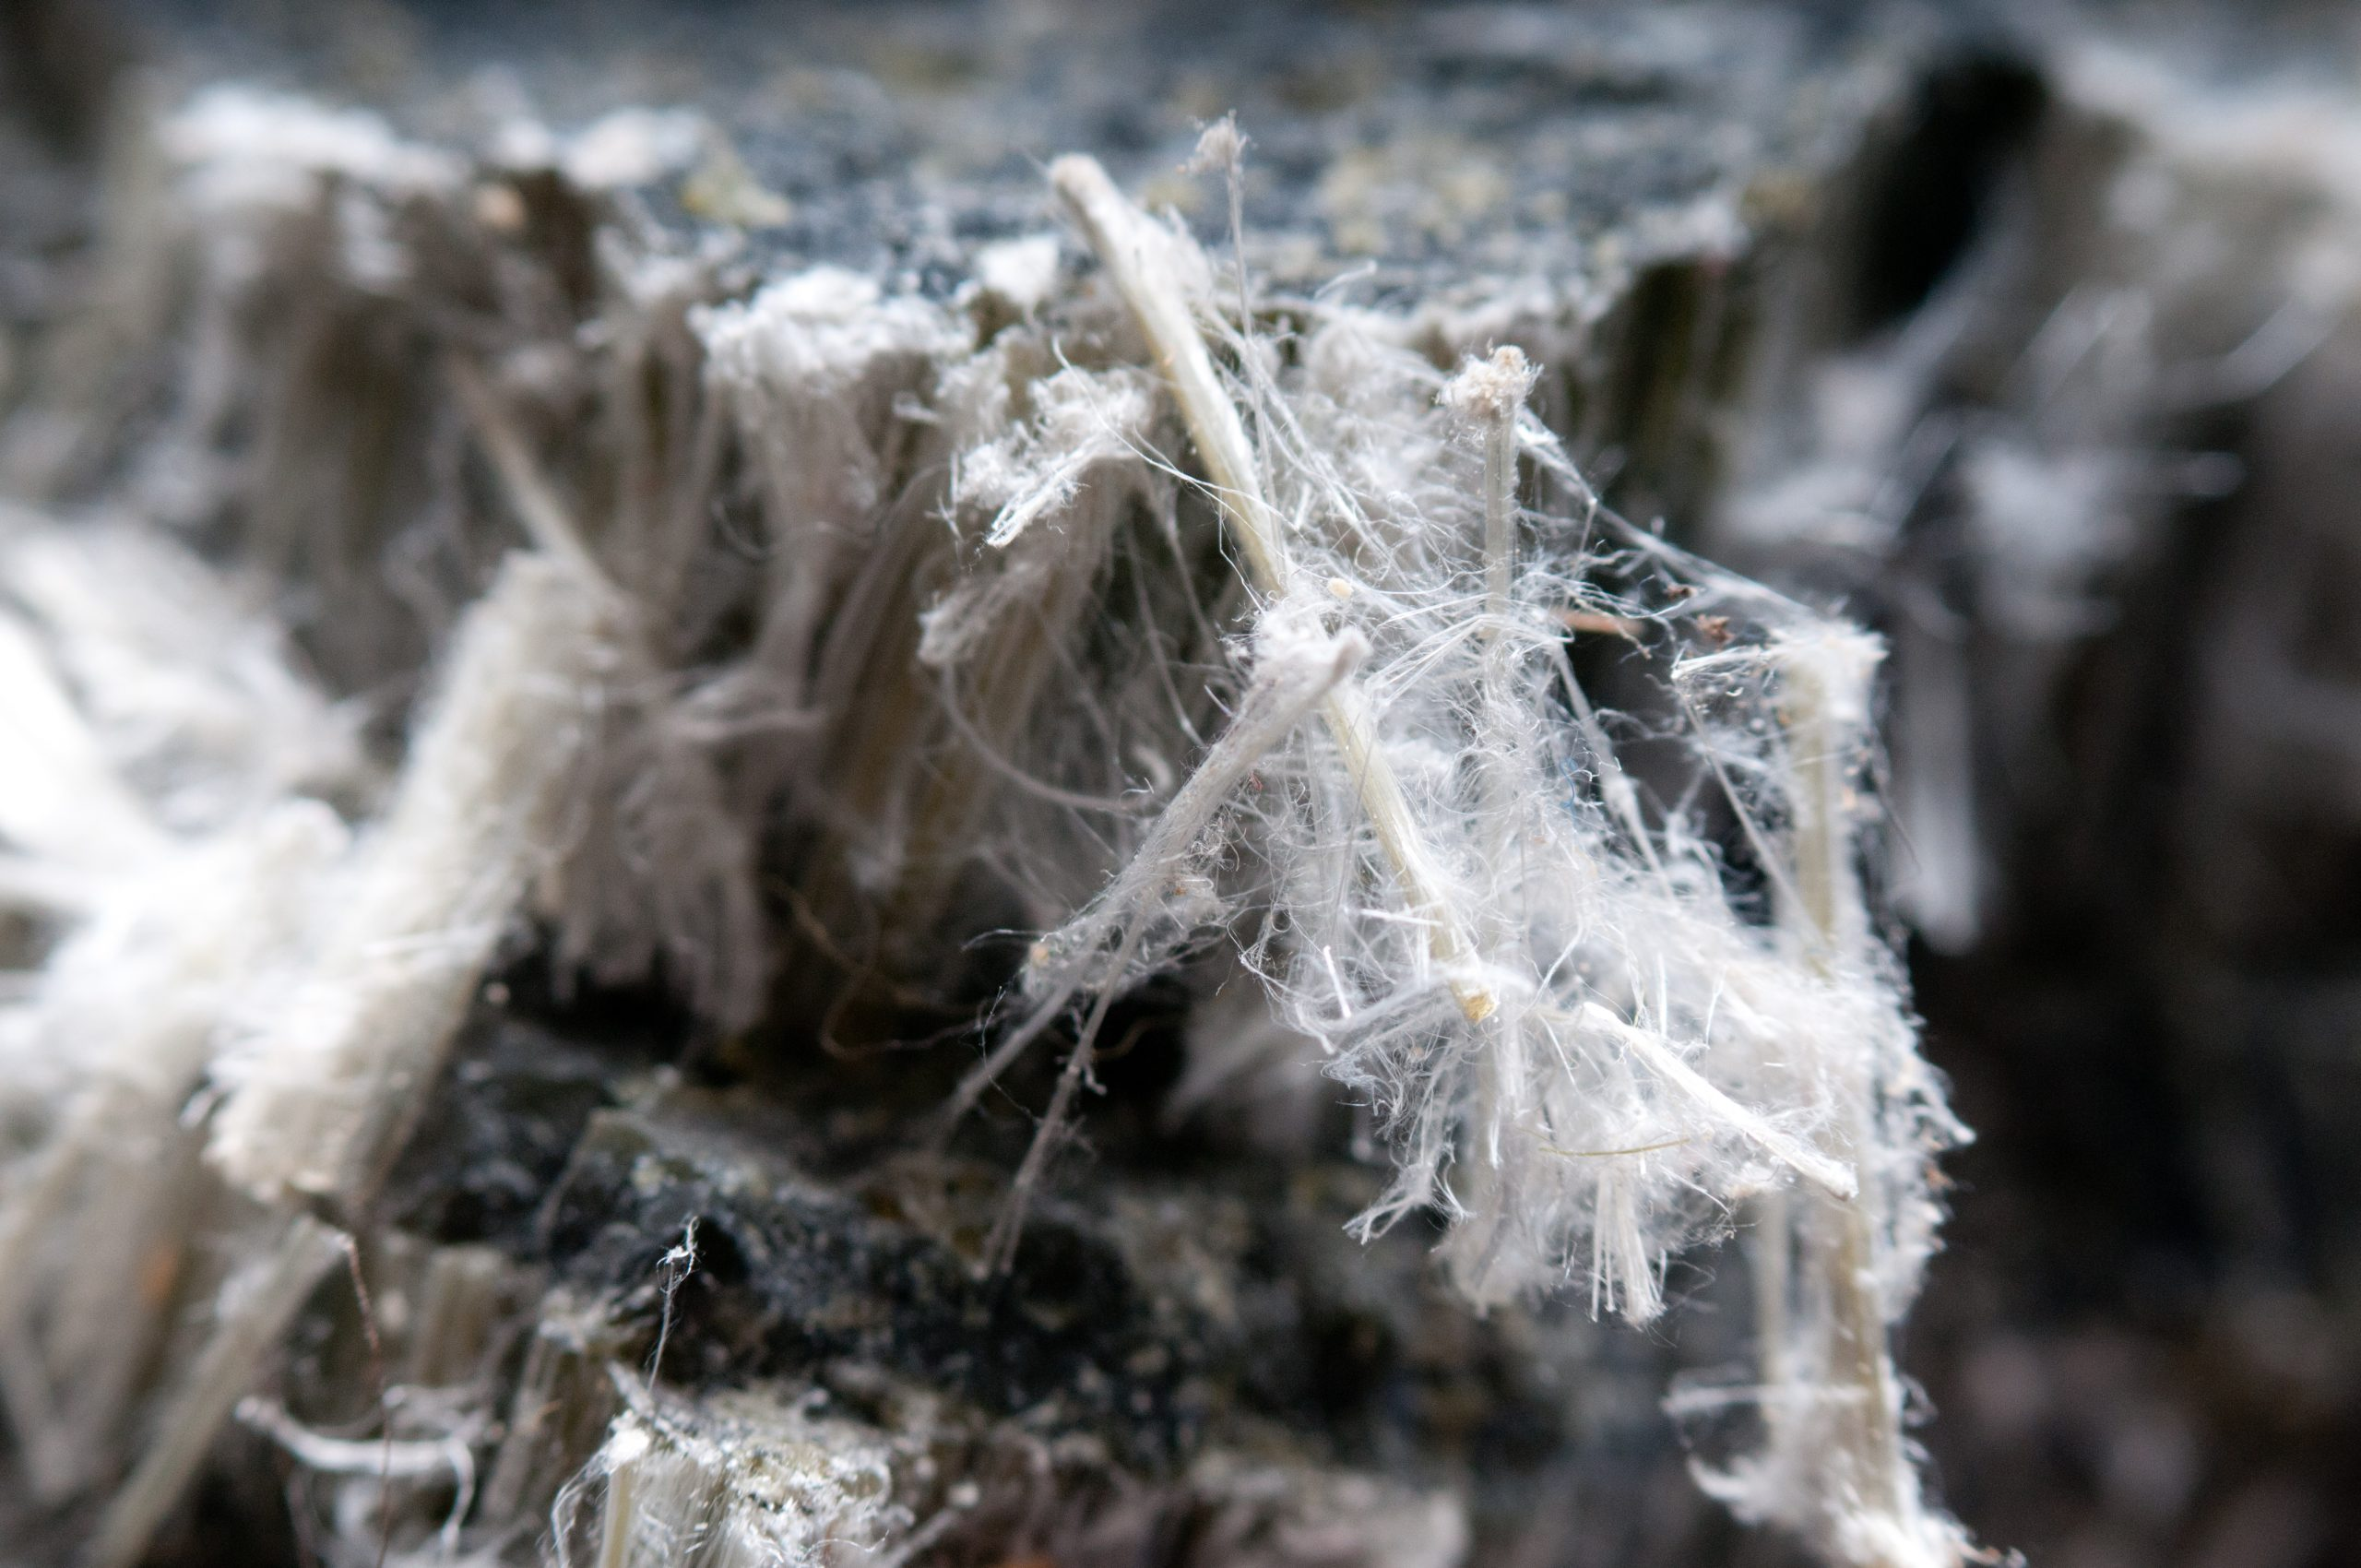 Asbestos fibers are hazardous to health